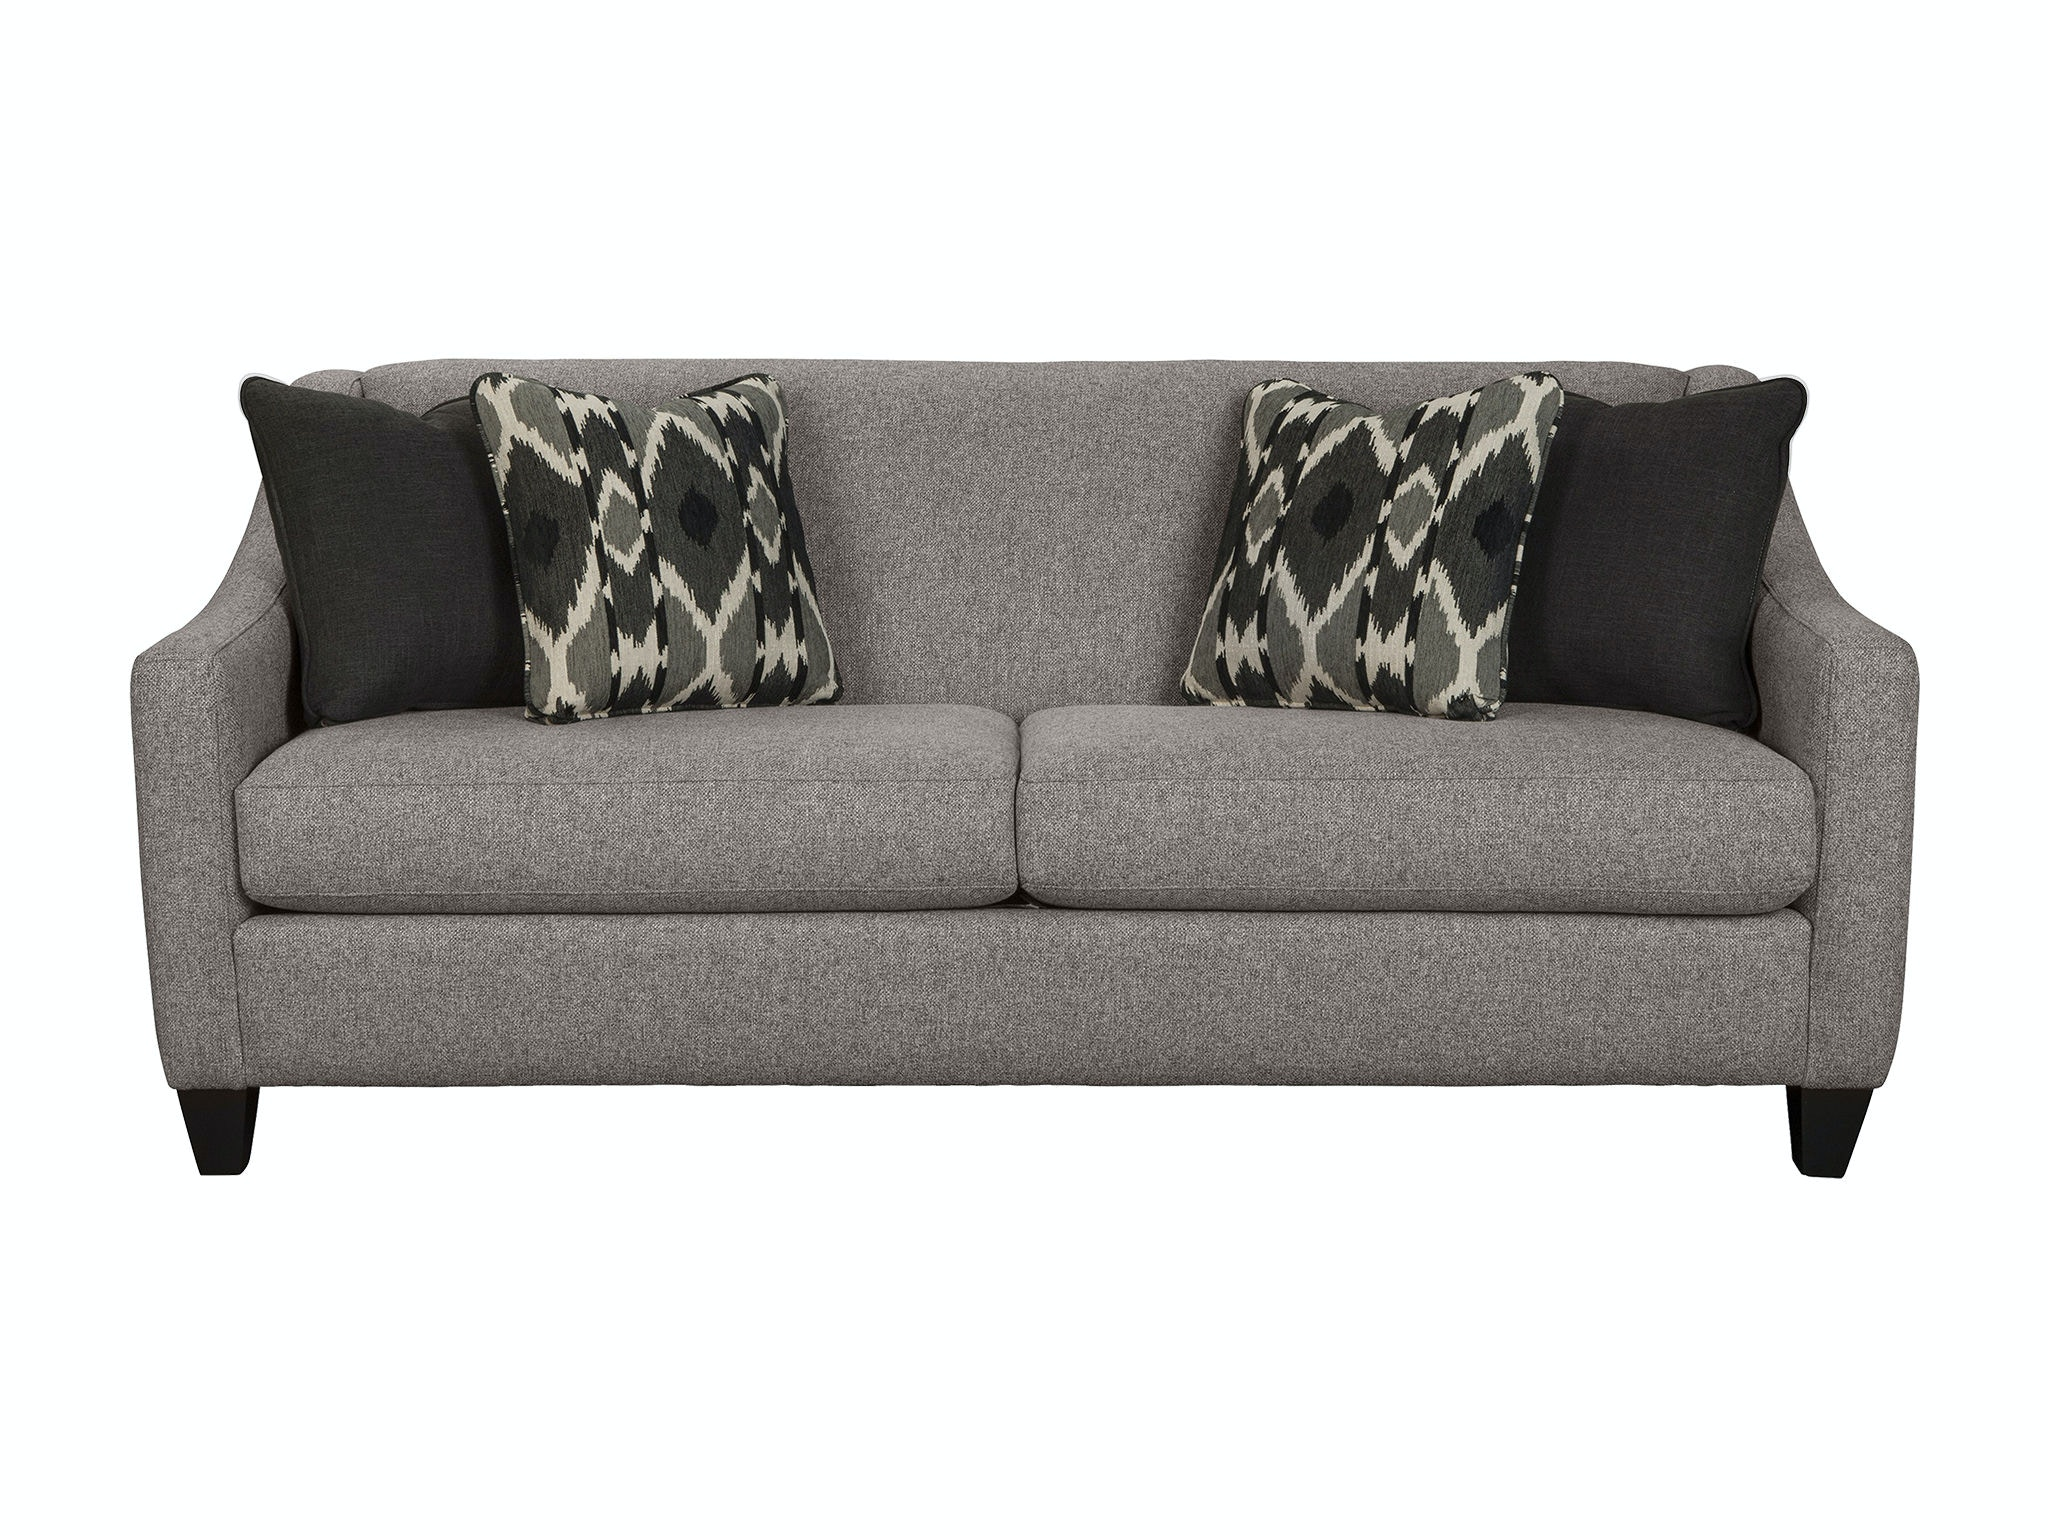 Craftmaster Living Room Sleeper Sofa 77695068 CraftMaster